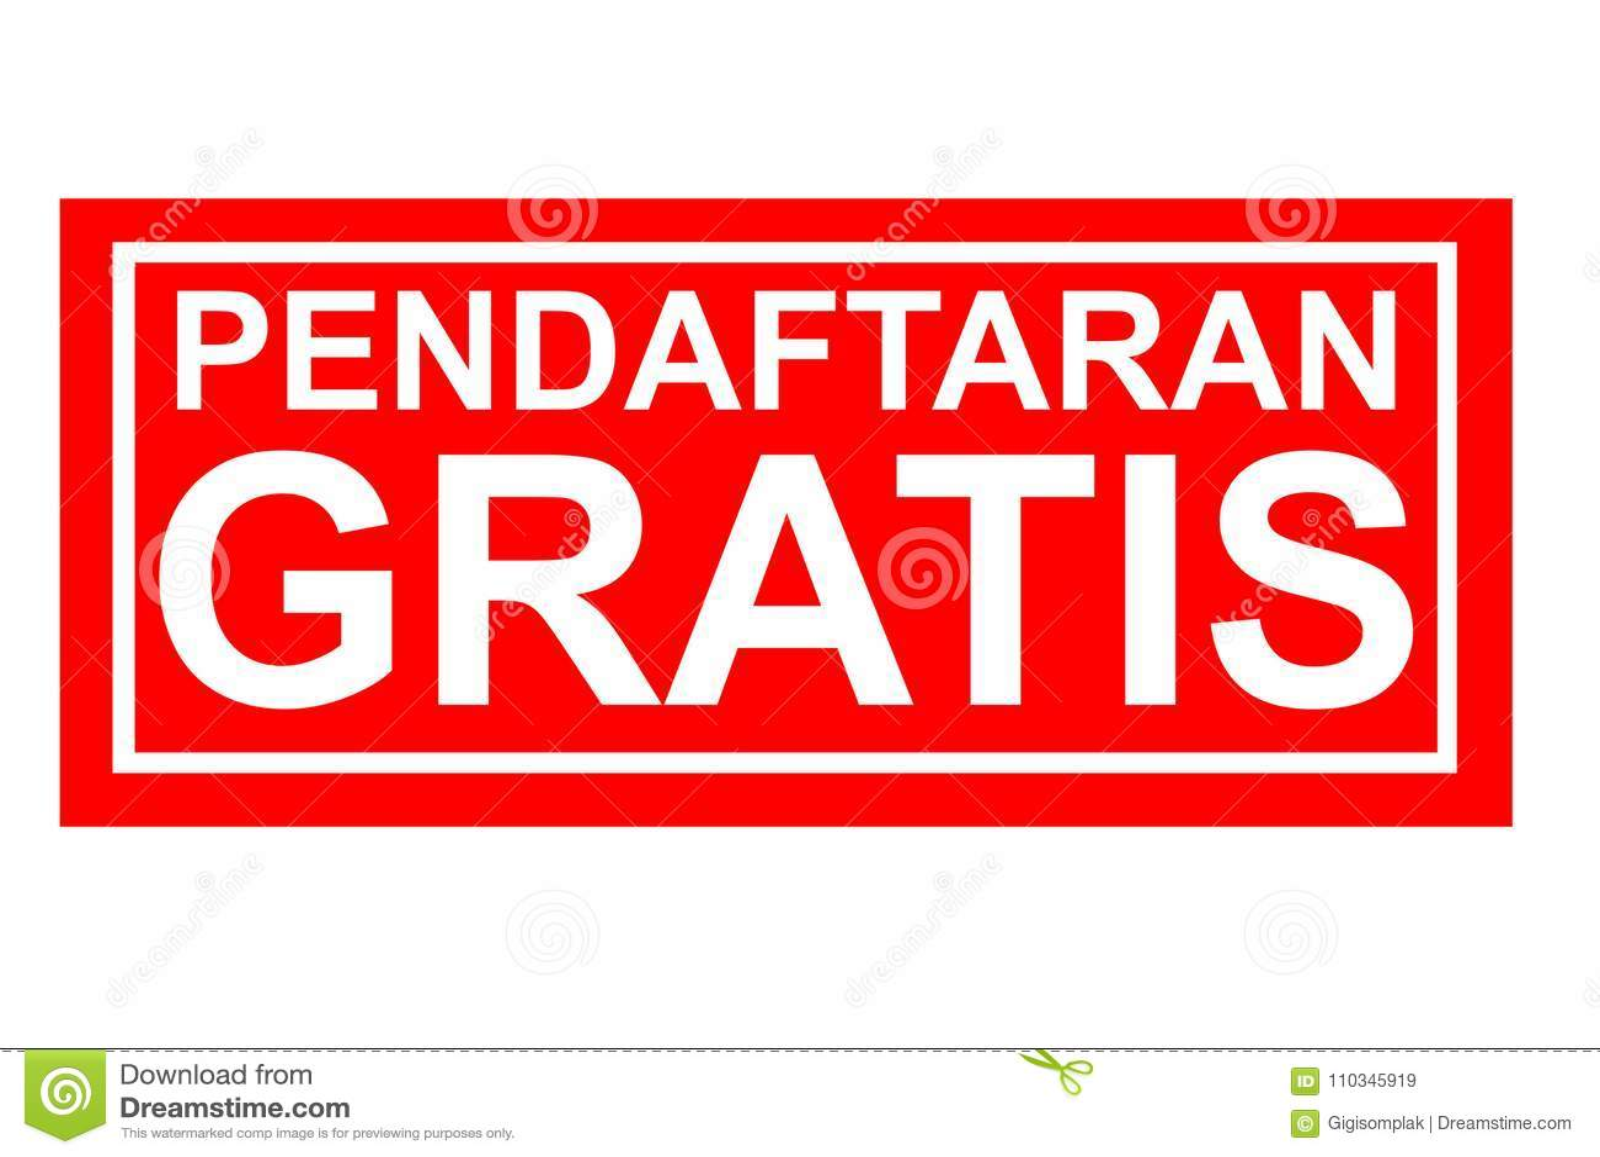 Gratis Freie Ausrichtung Stempel Effekt Pendaftaran In Indonesien